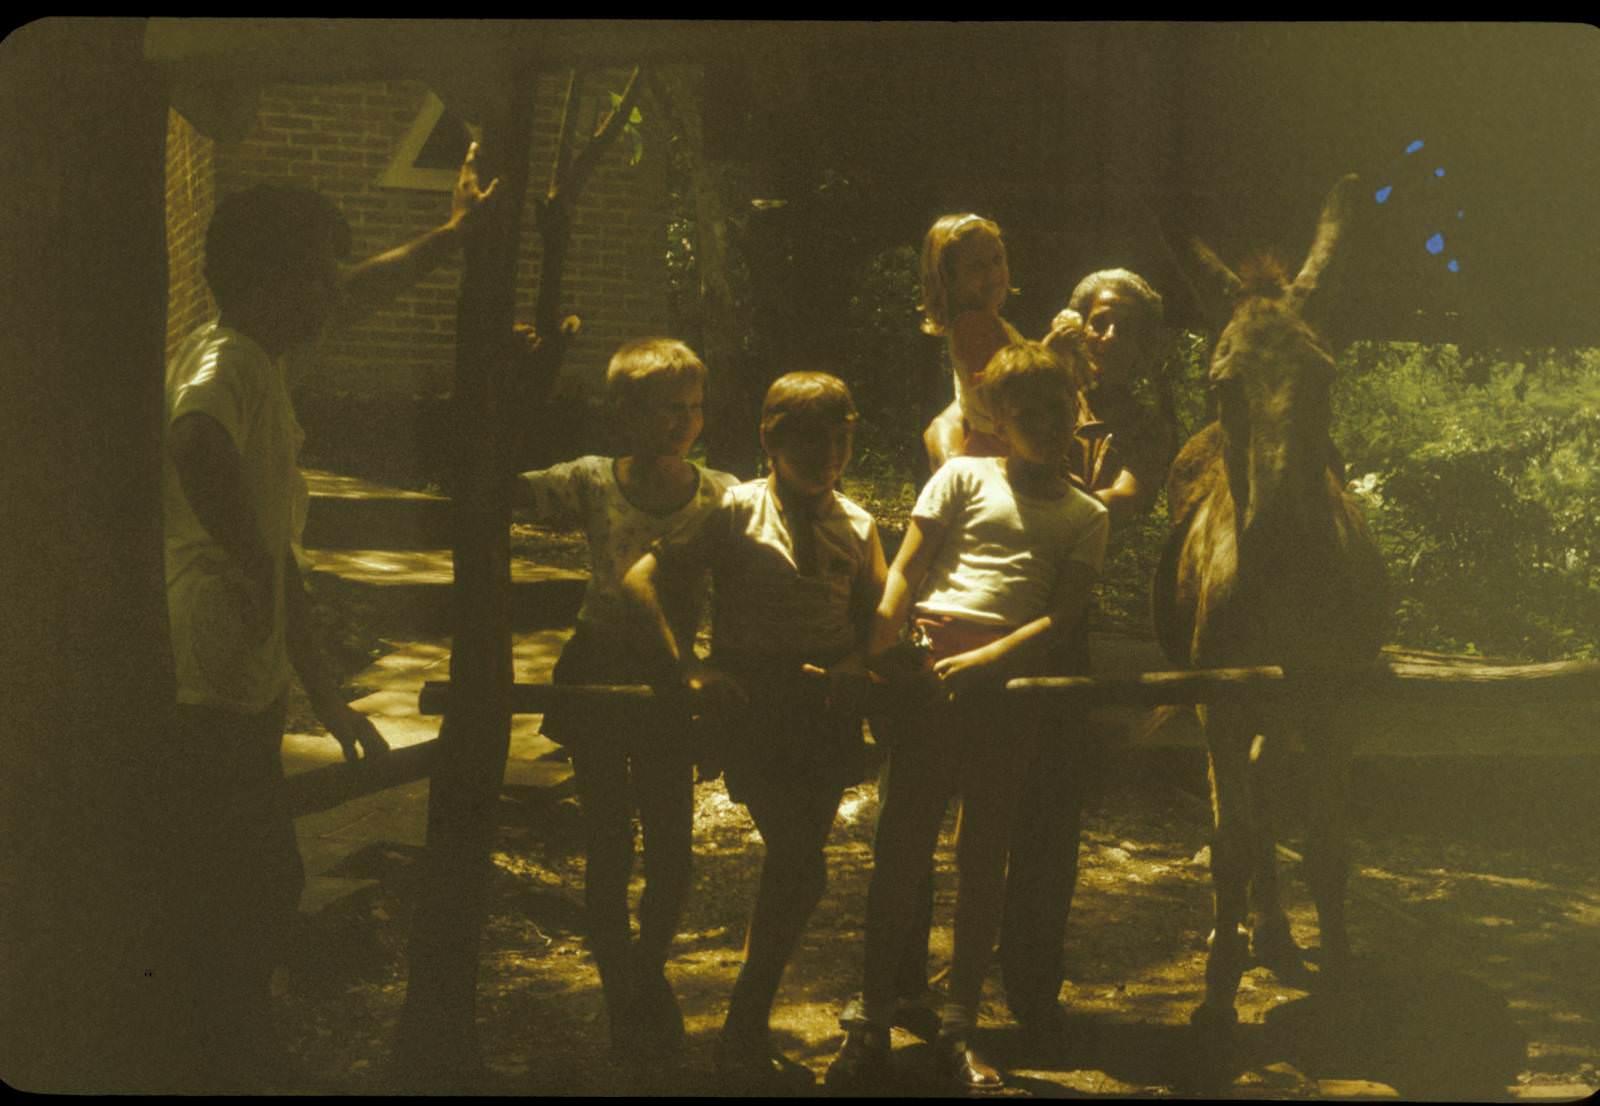 115. 1988. Mirador de Mayabe, окрестности Ольгина, фото 7